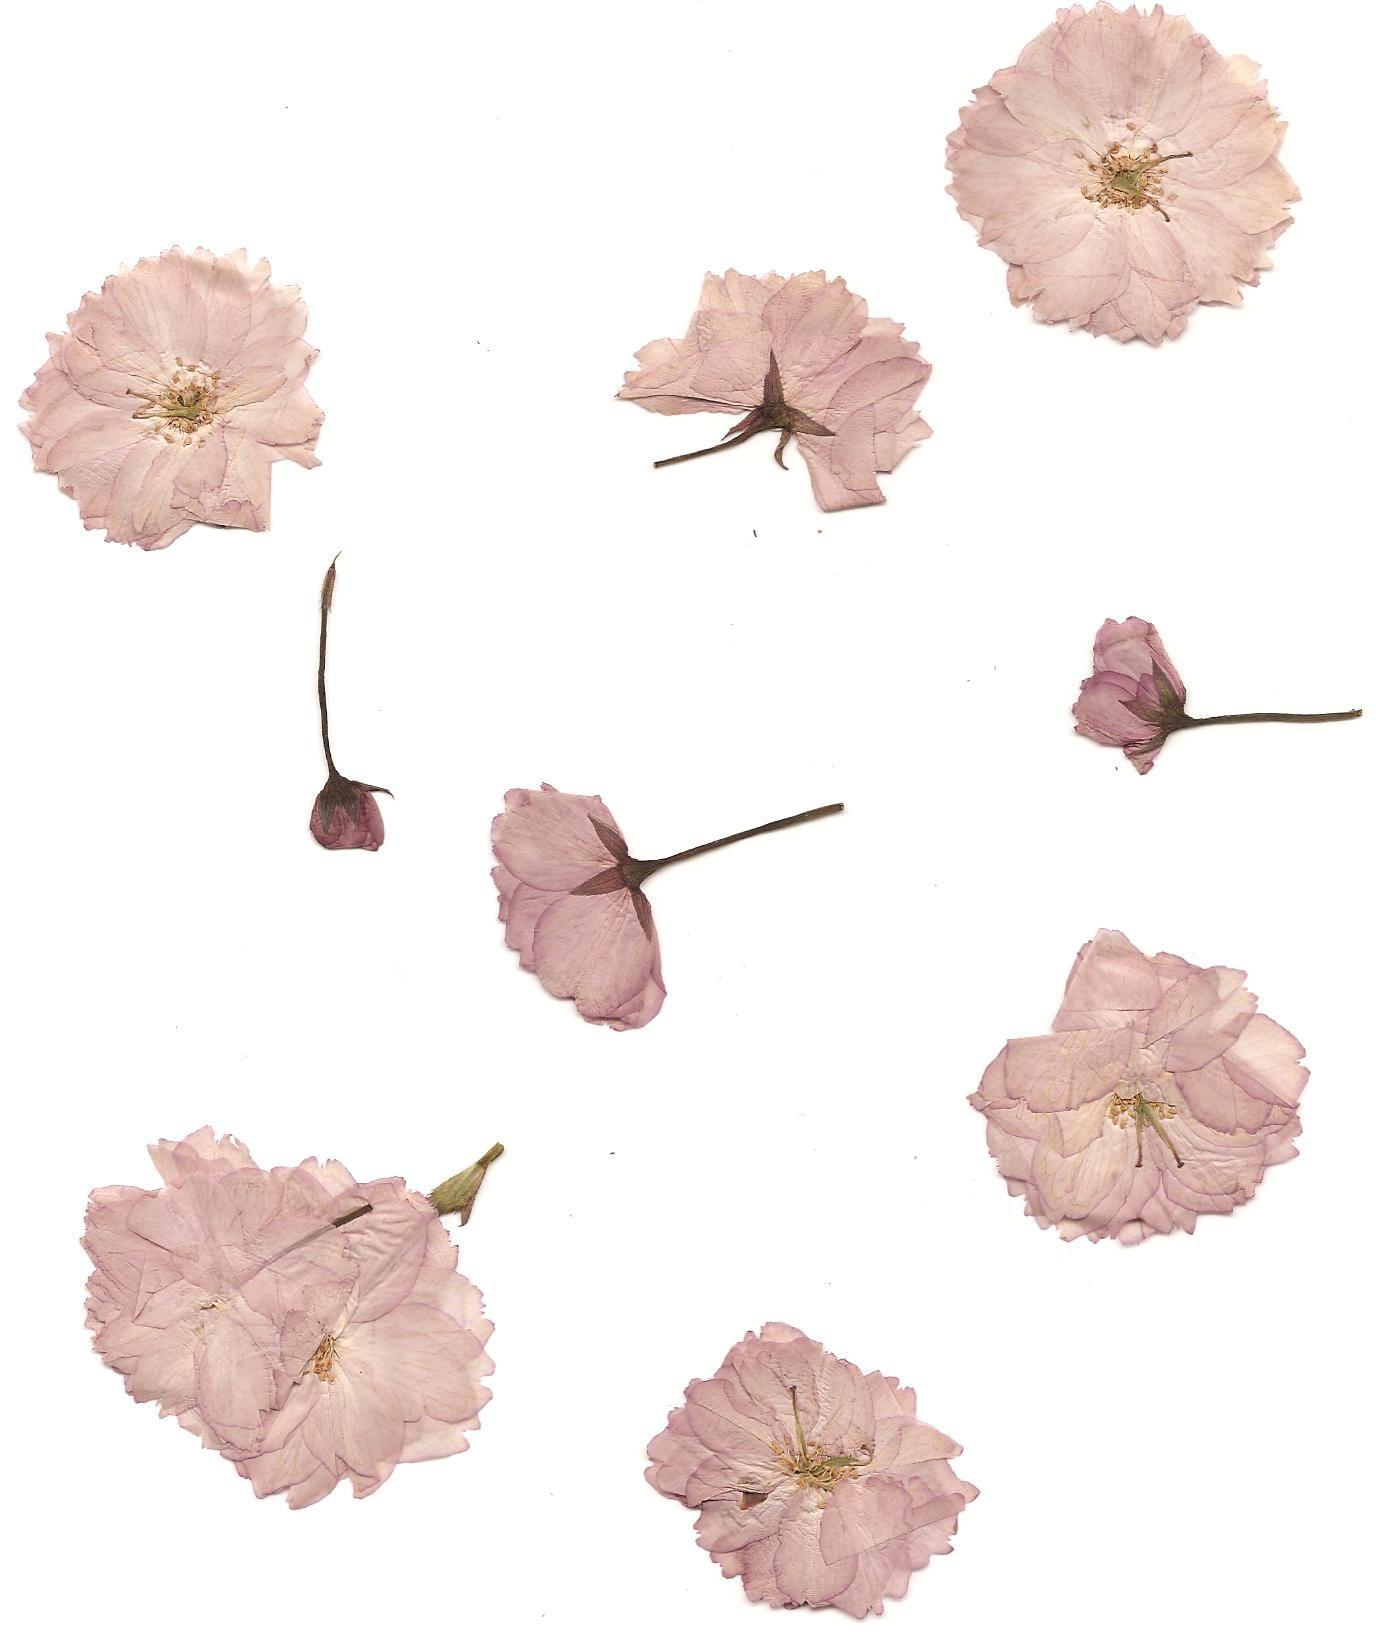 Pressed Cherry Blossoms By Lovableluma Flower Aesthetic Pressed Flowers Flowers